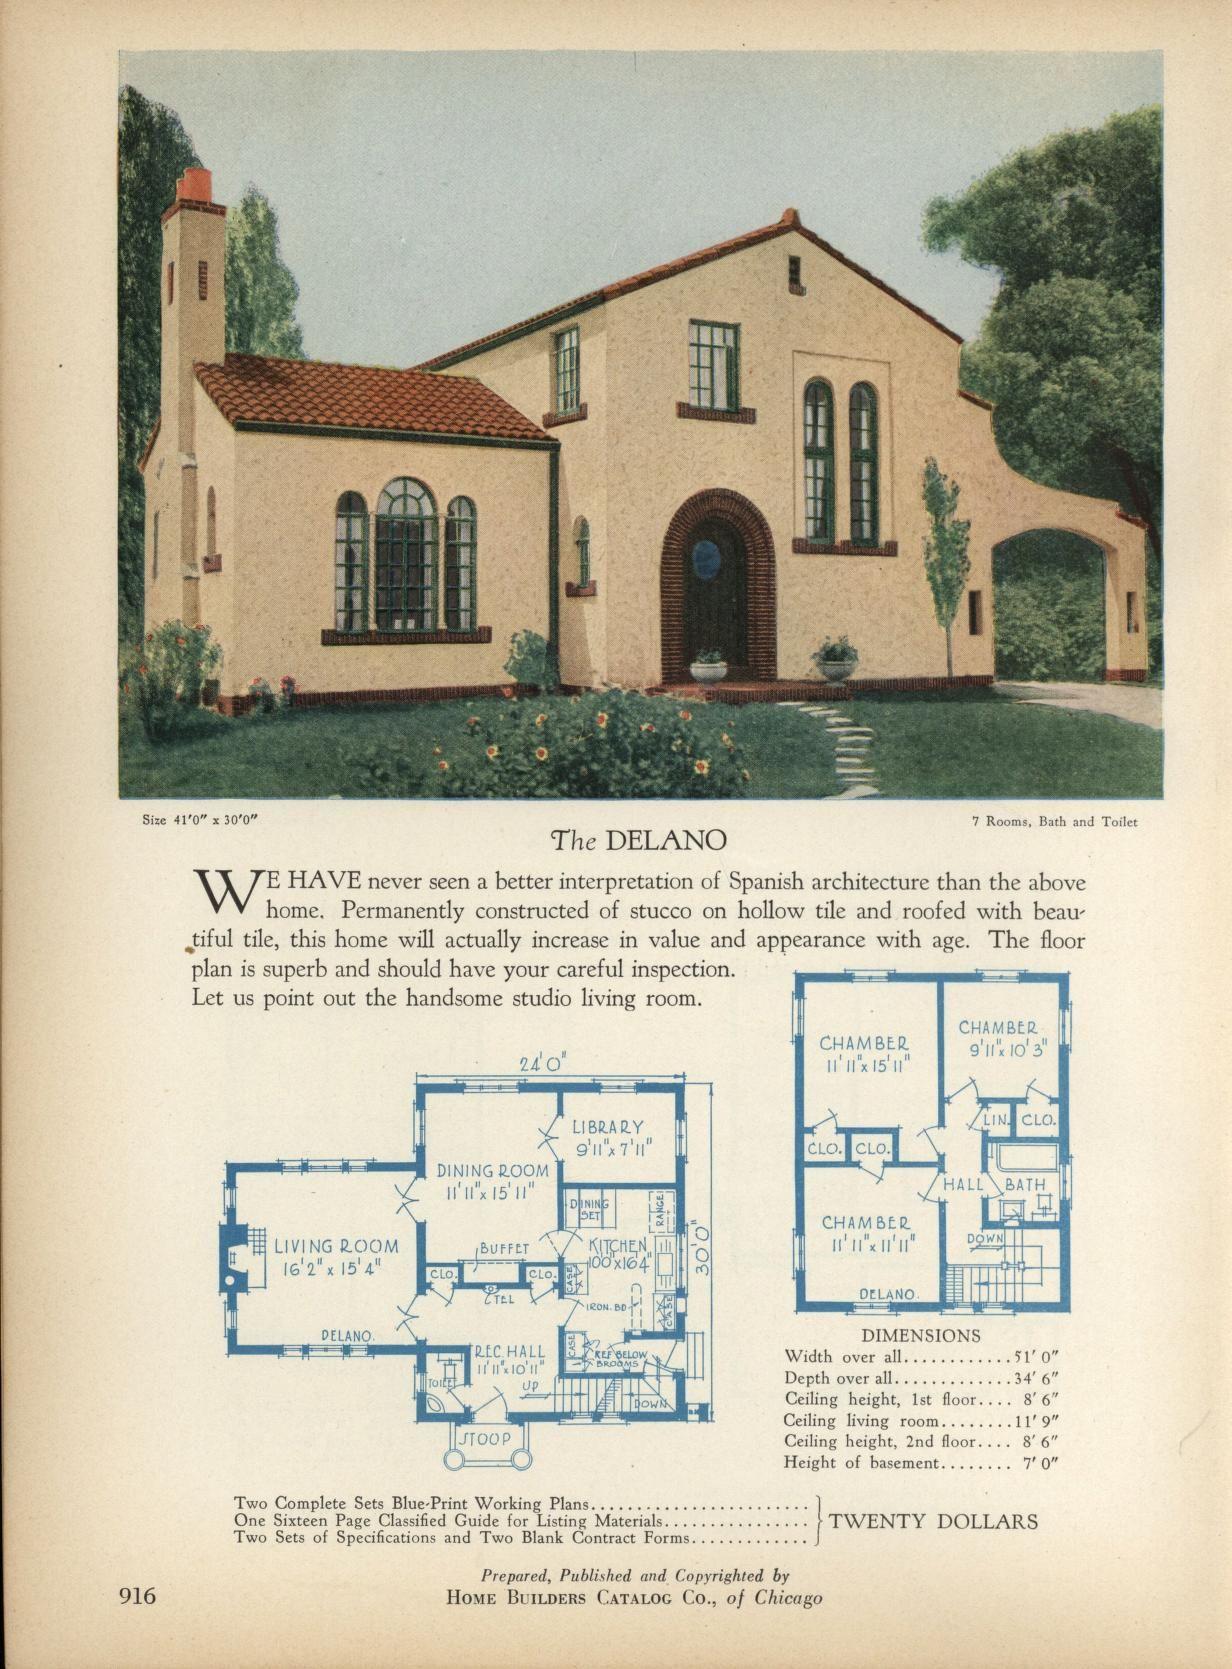 The DELANO Home Builders Catalog plans